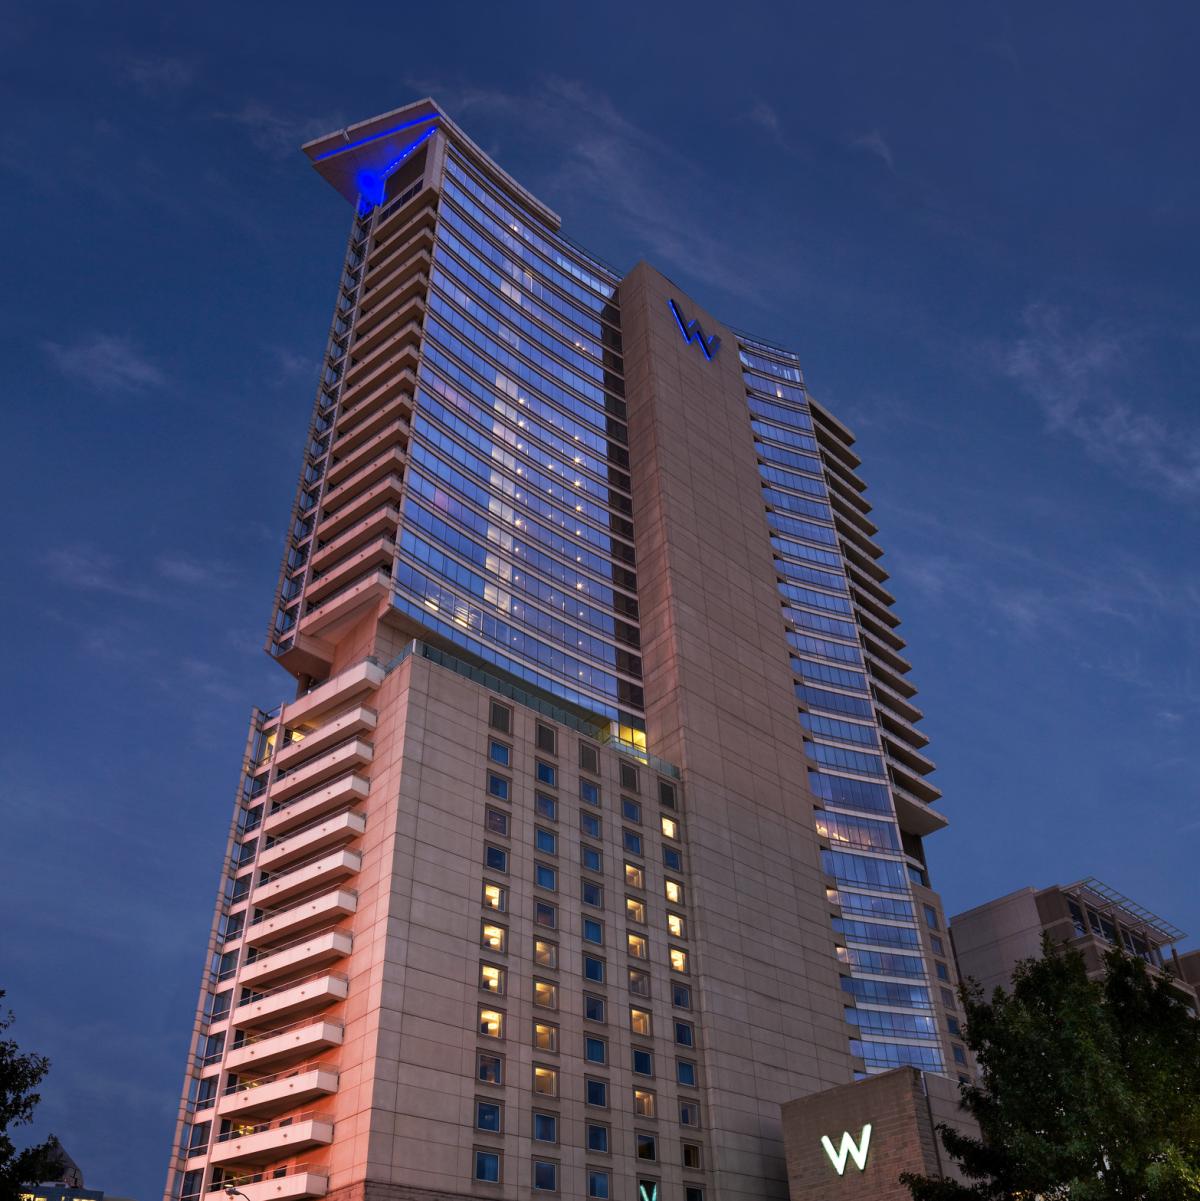 w dallas, victory exterior hotel at night